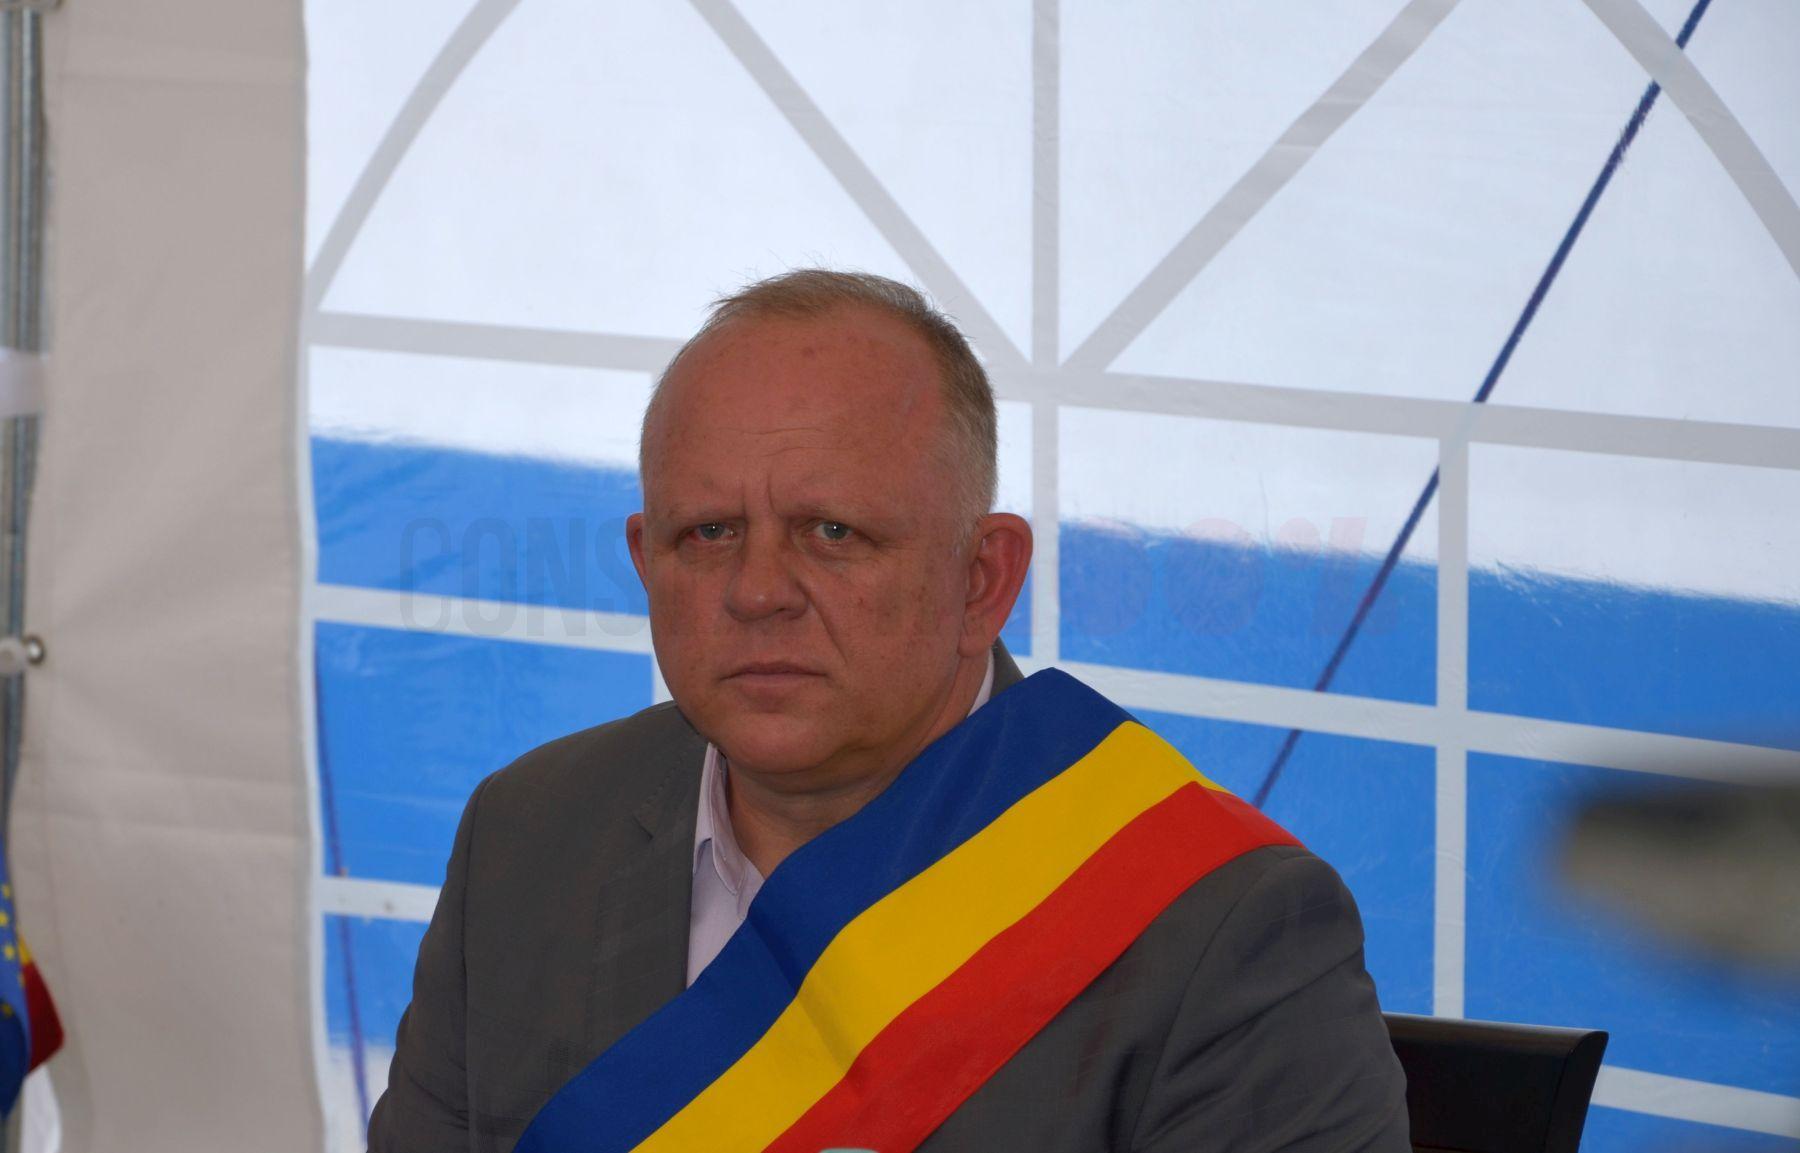 Cristian-Maricel-Cirjaliu-Agigea